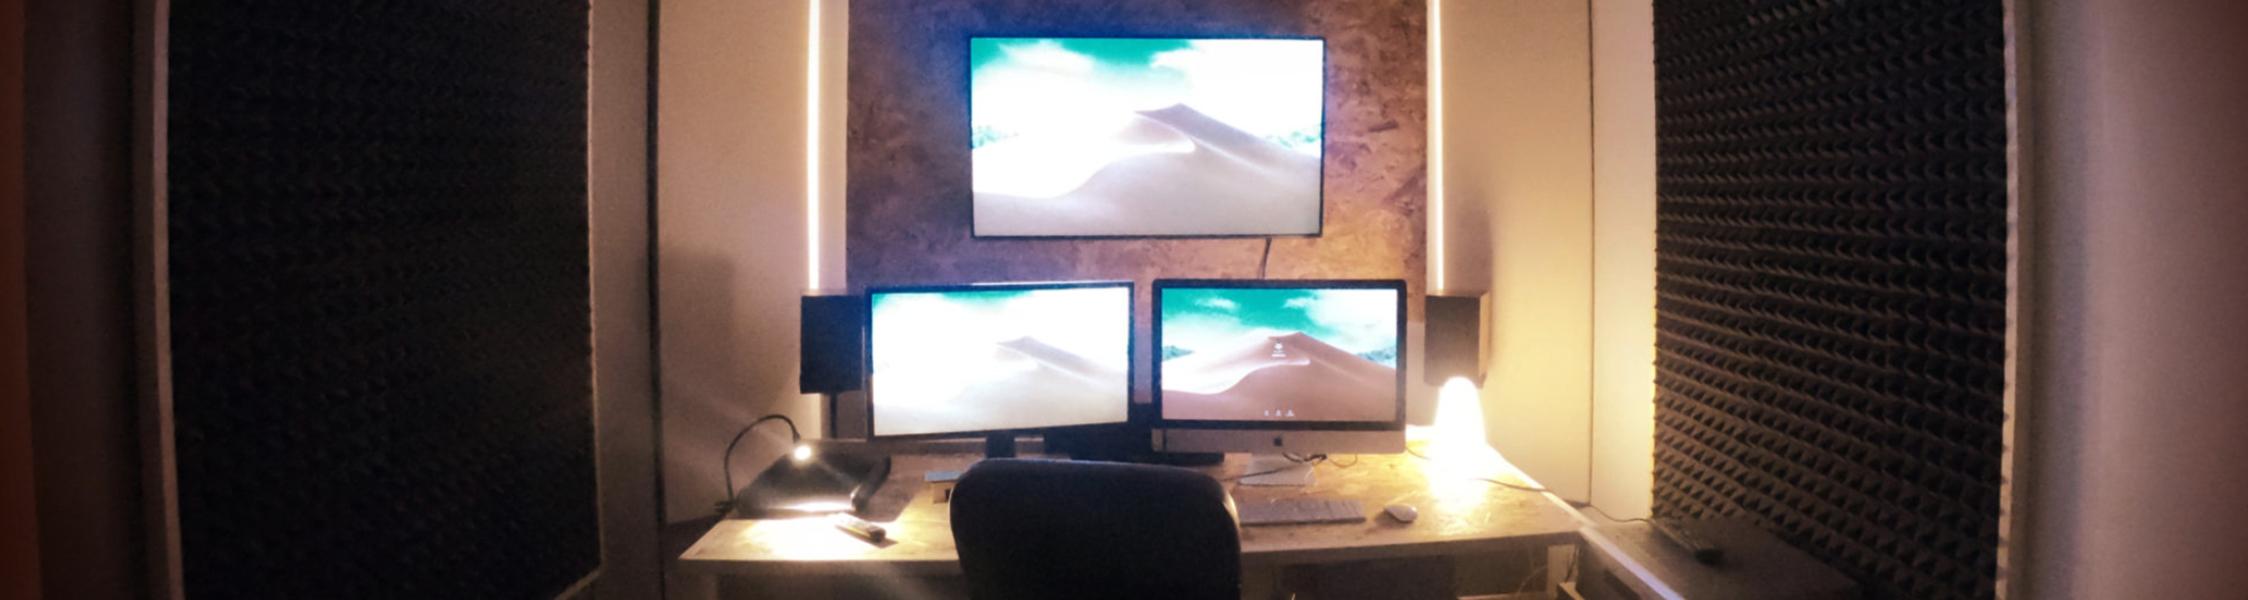 sala-postproduction-valencia-alquiler-audiovisual-ukpikproductions